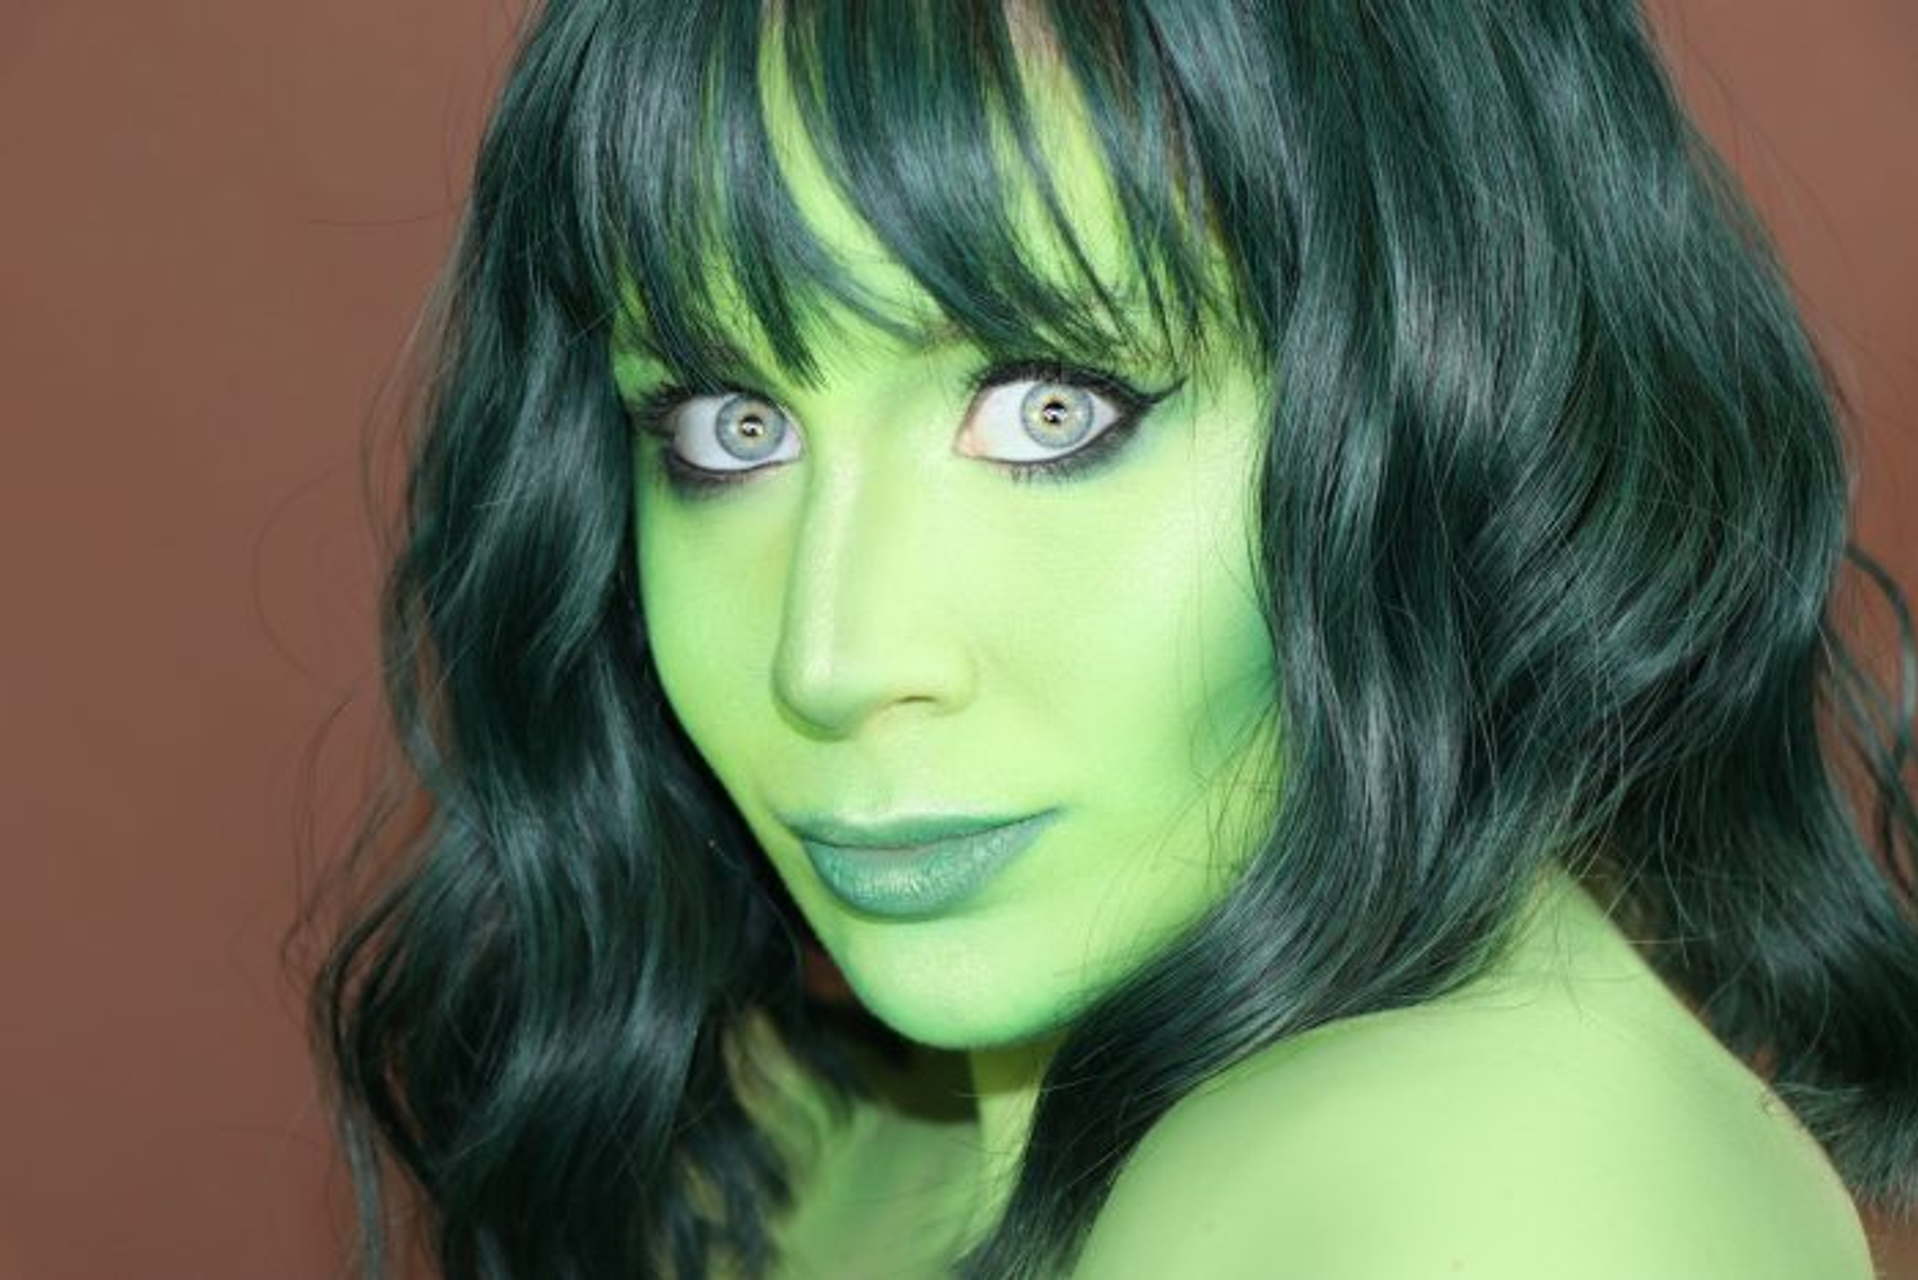 She Hulk Makeup Tutorial Marvel Cosplay 2020 Lillee Jean In 2020 She Hulk Transformation Shehulk Marvel Cosplay